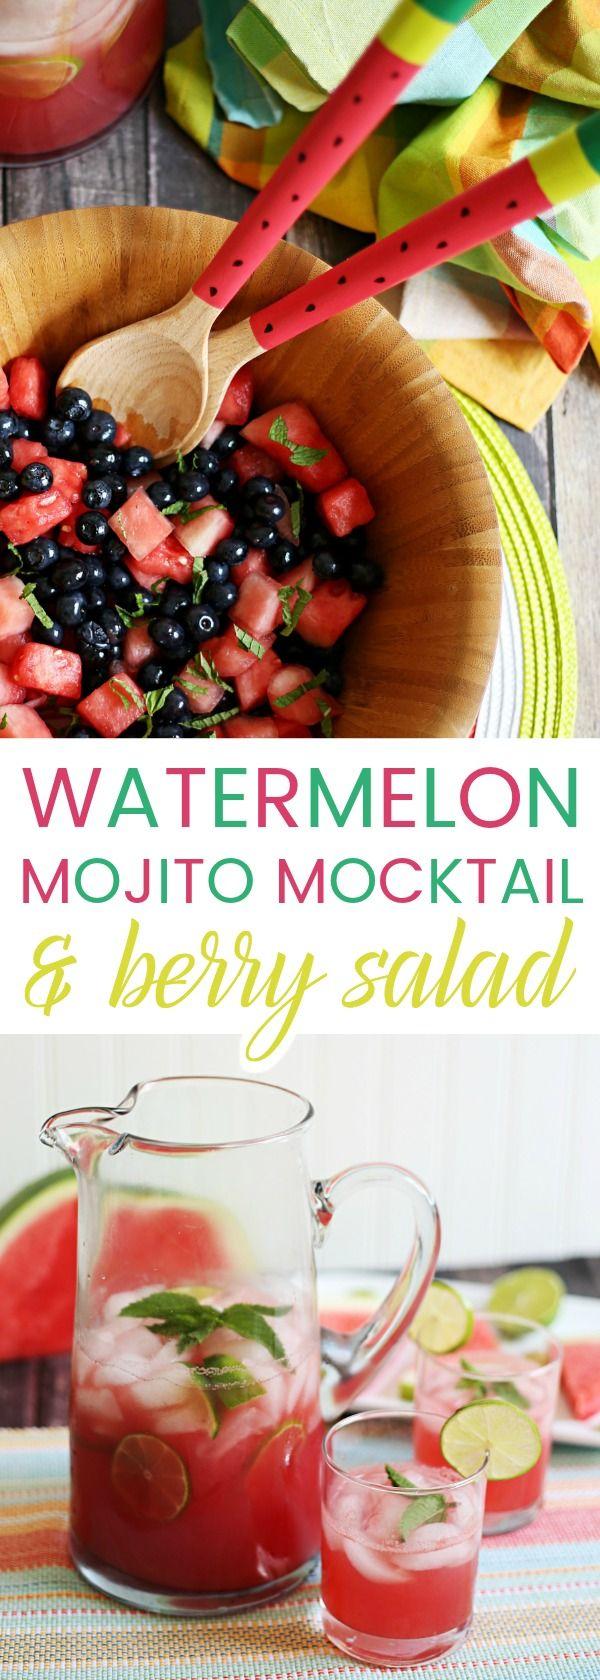 Share a Slice of Summer: Watermelon Mojito Mocktail & Watermelon Berry Mojito Salad via @fieryone